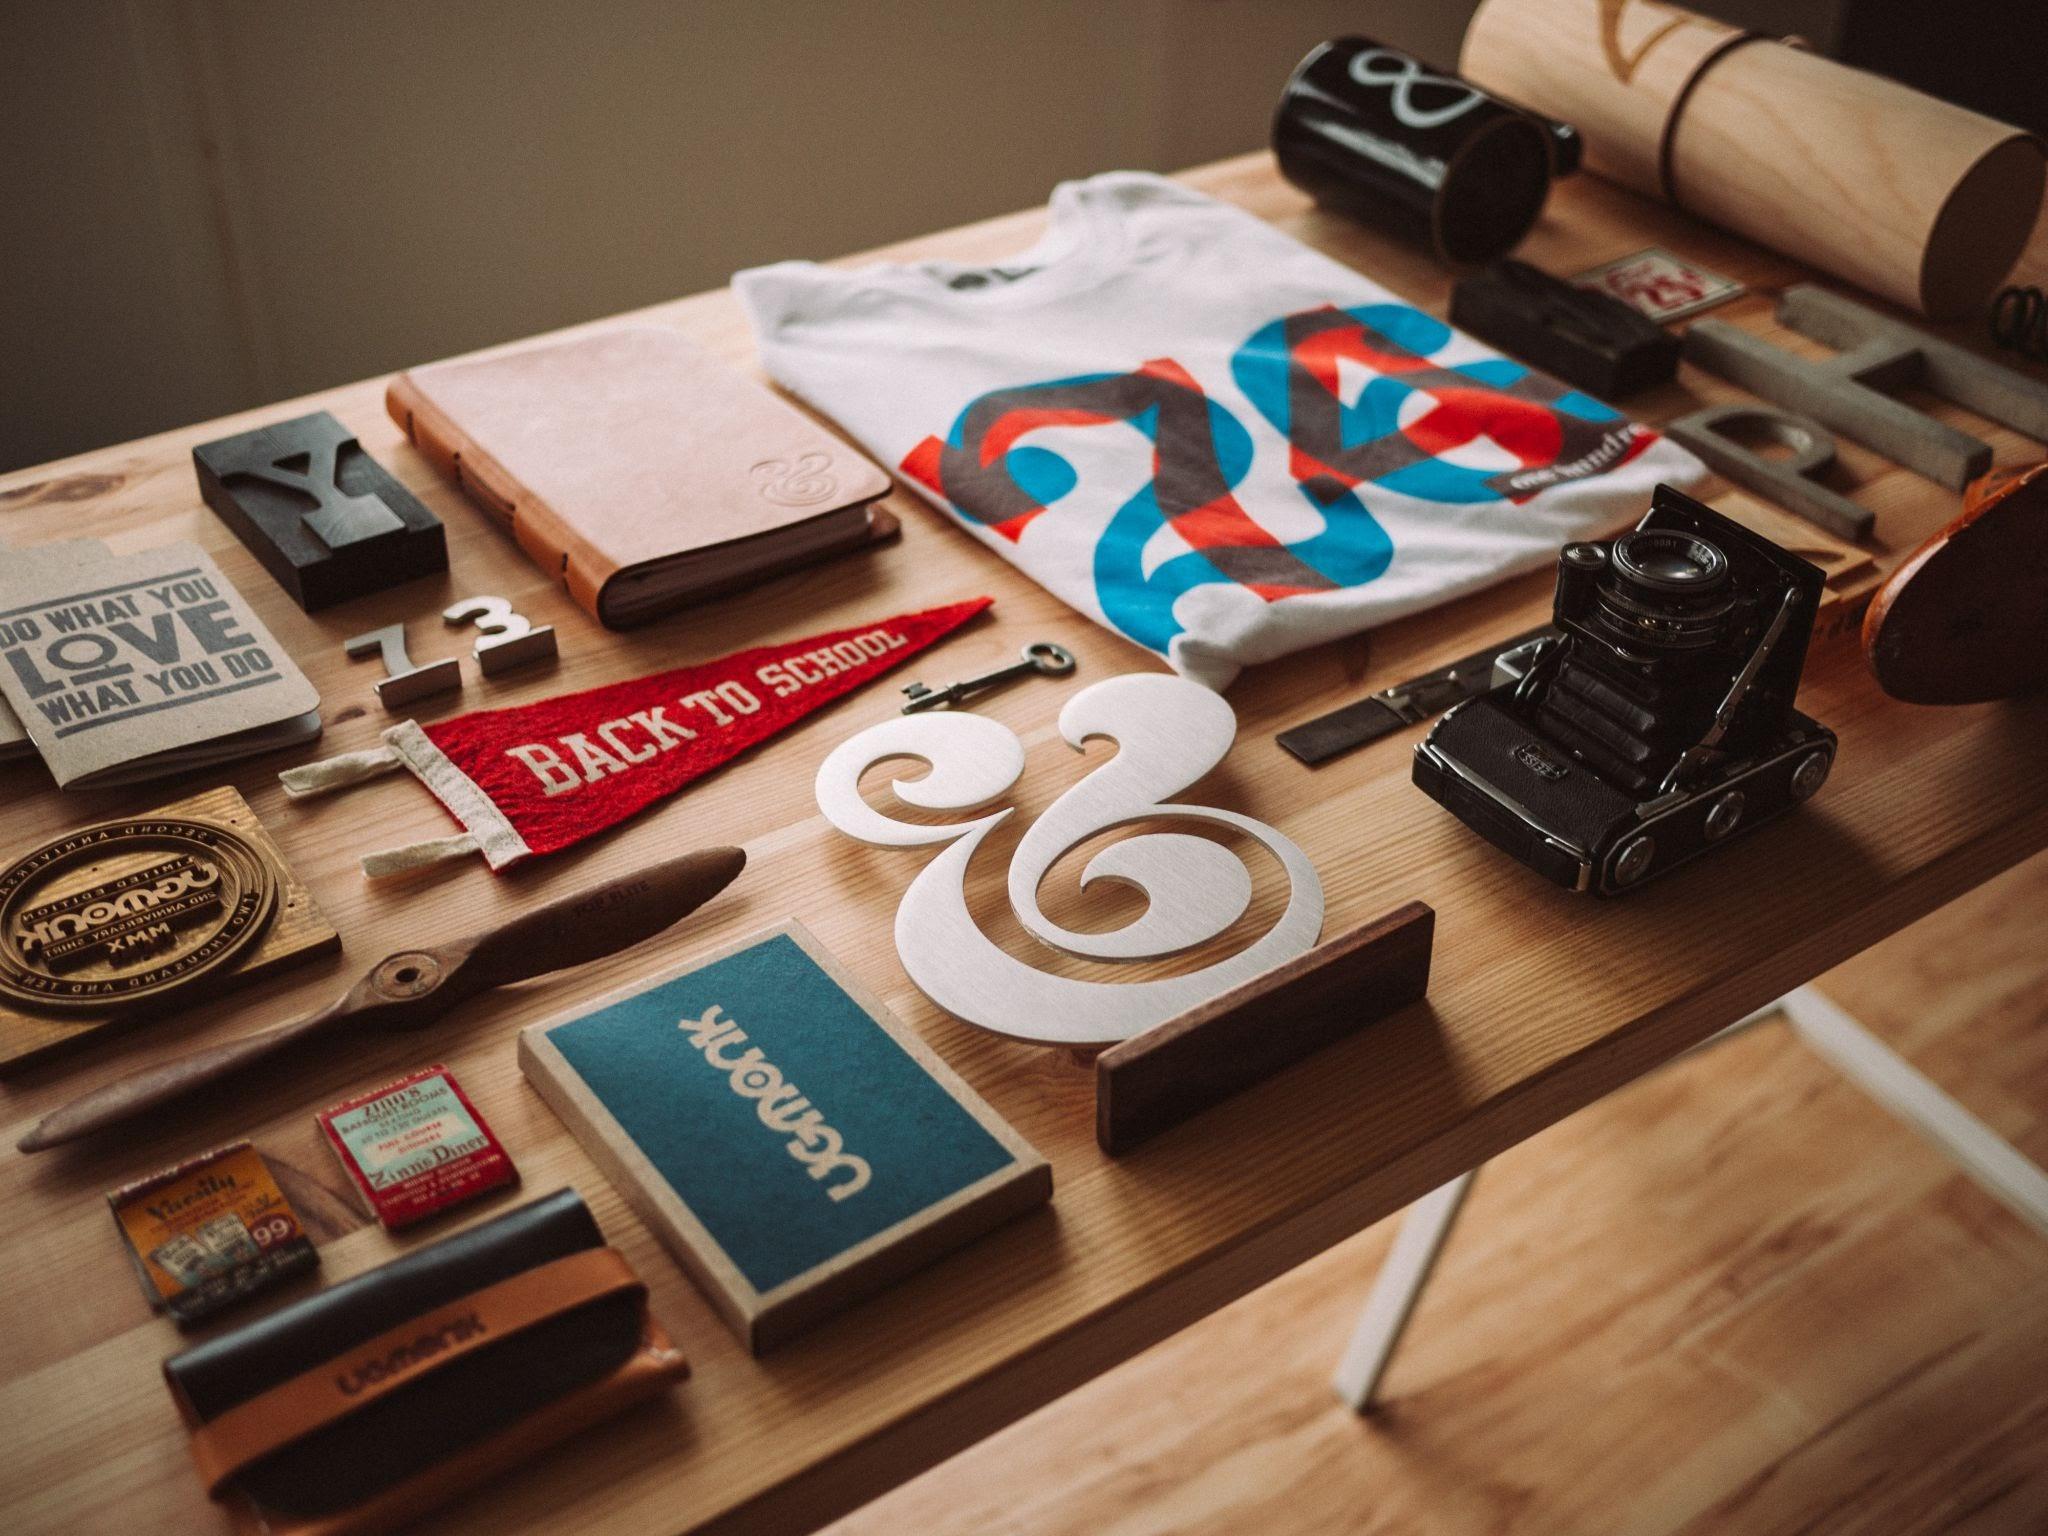 Organising items